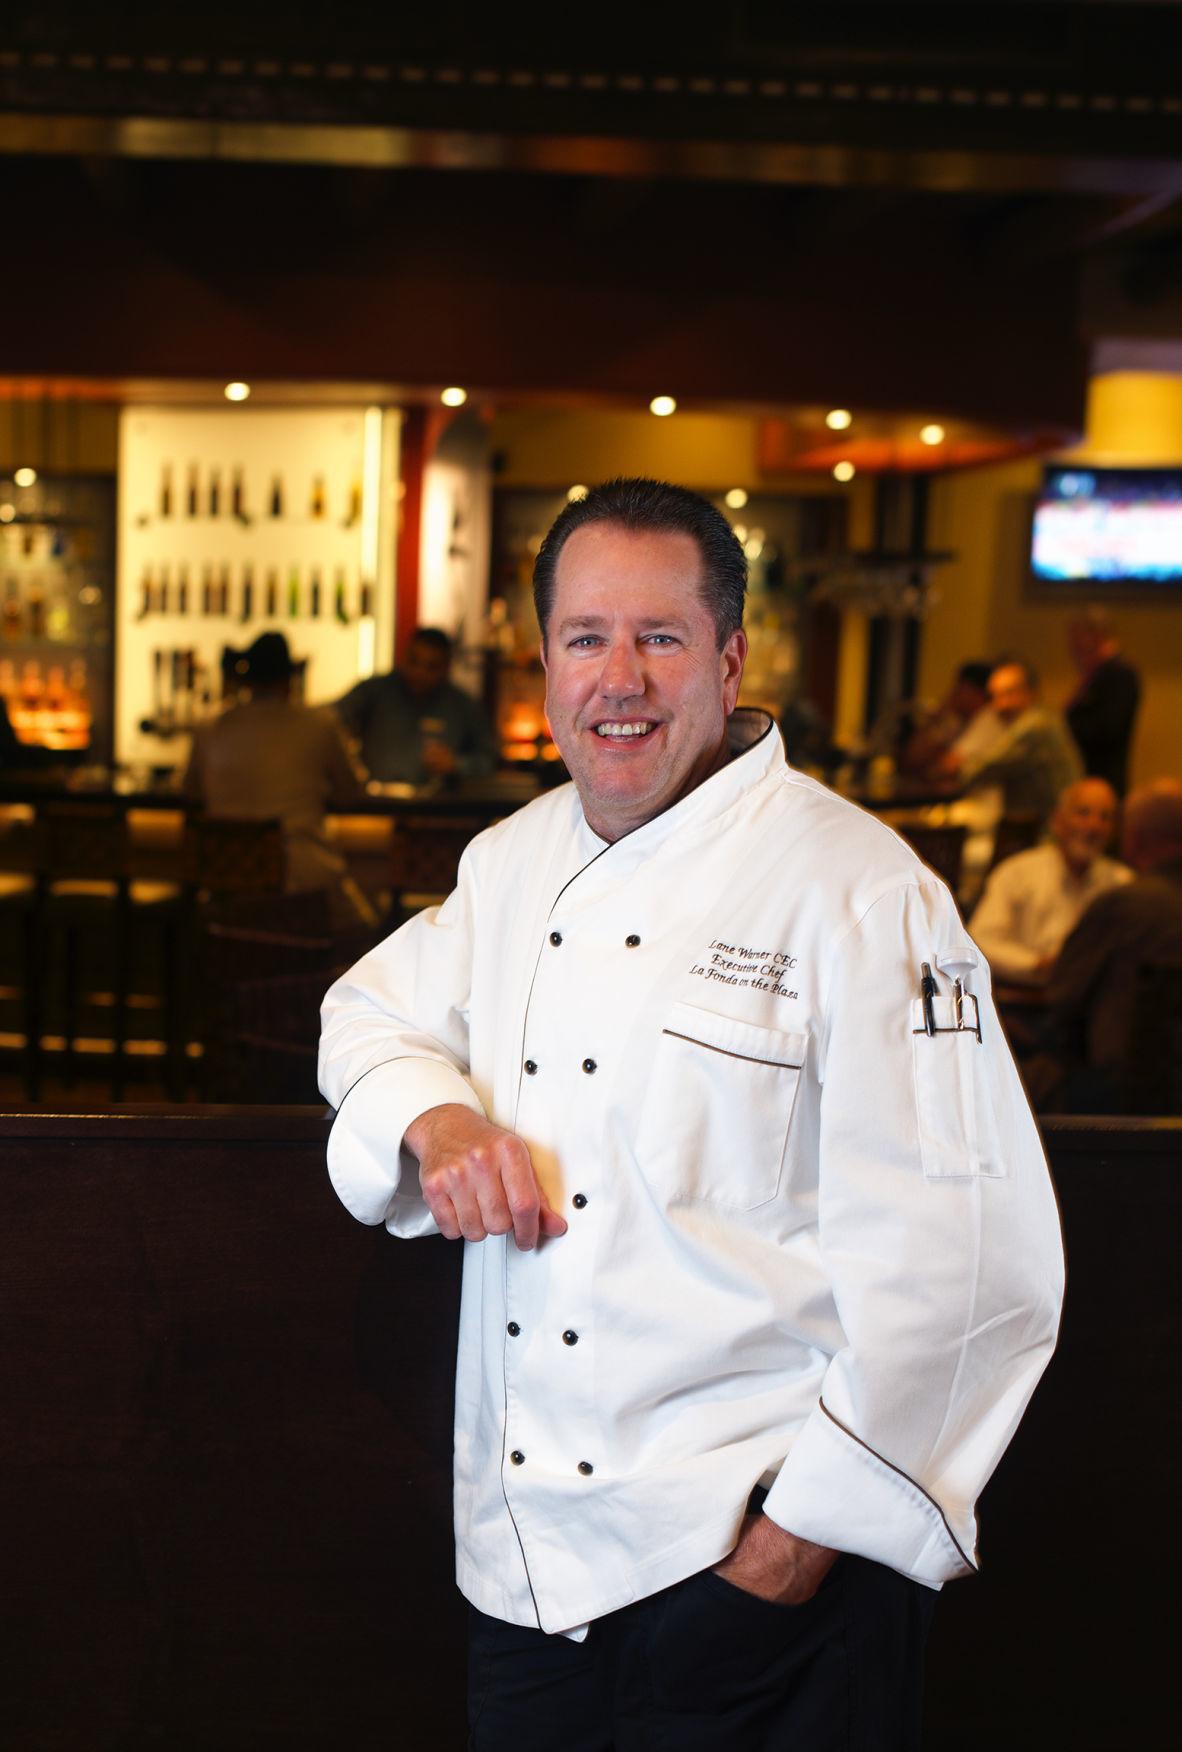 Chef Warner of La Fonda